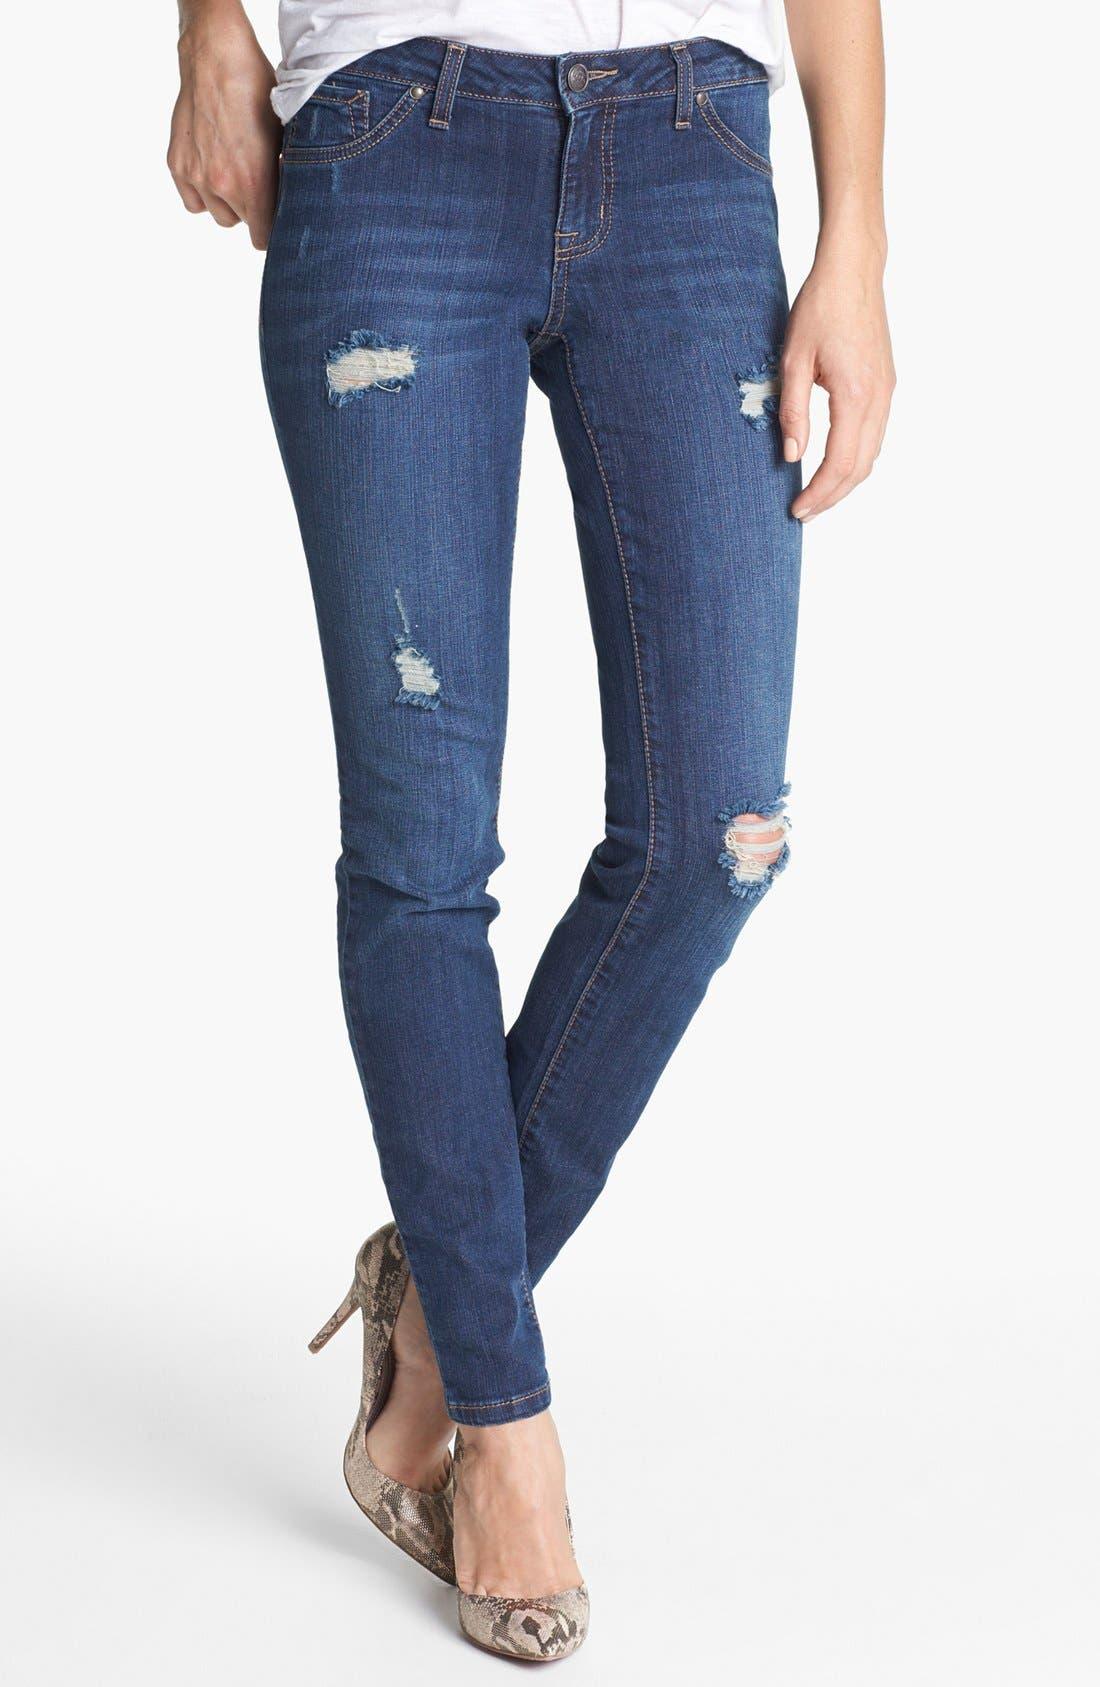 Main Image - Jessica Simpson 'Kiss Me' Deconstructed Skinny Jeans (Bing Bang)